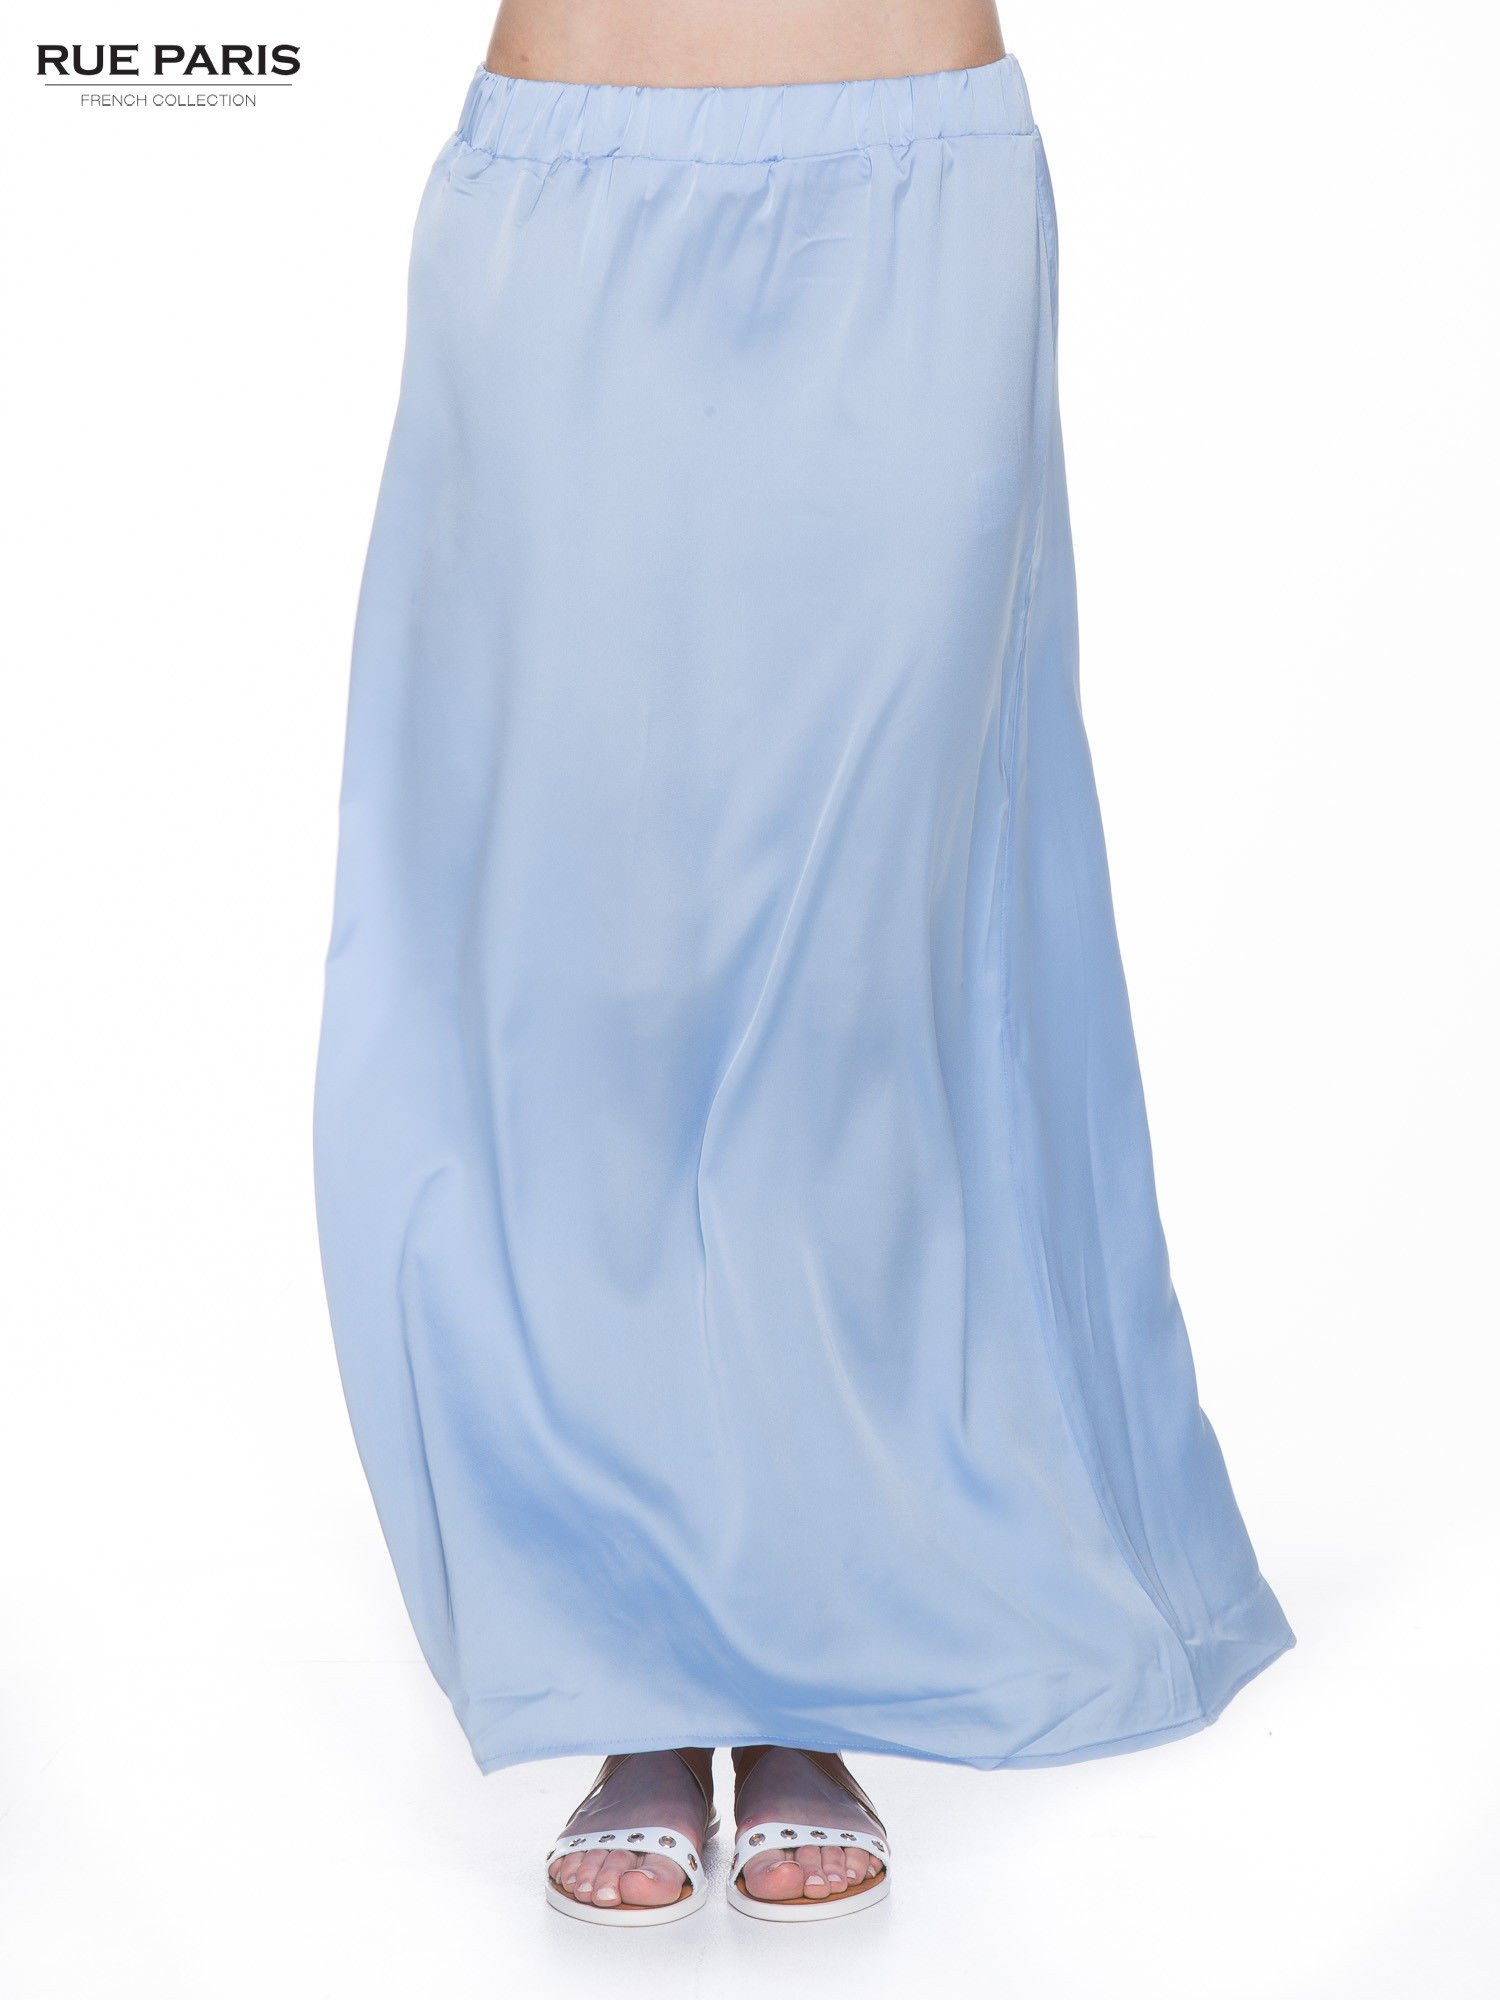 Jasnoniebieska długa spódnica maxi                                  zdj.                                  1